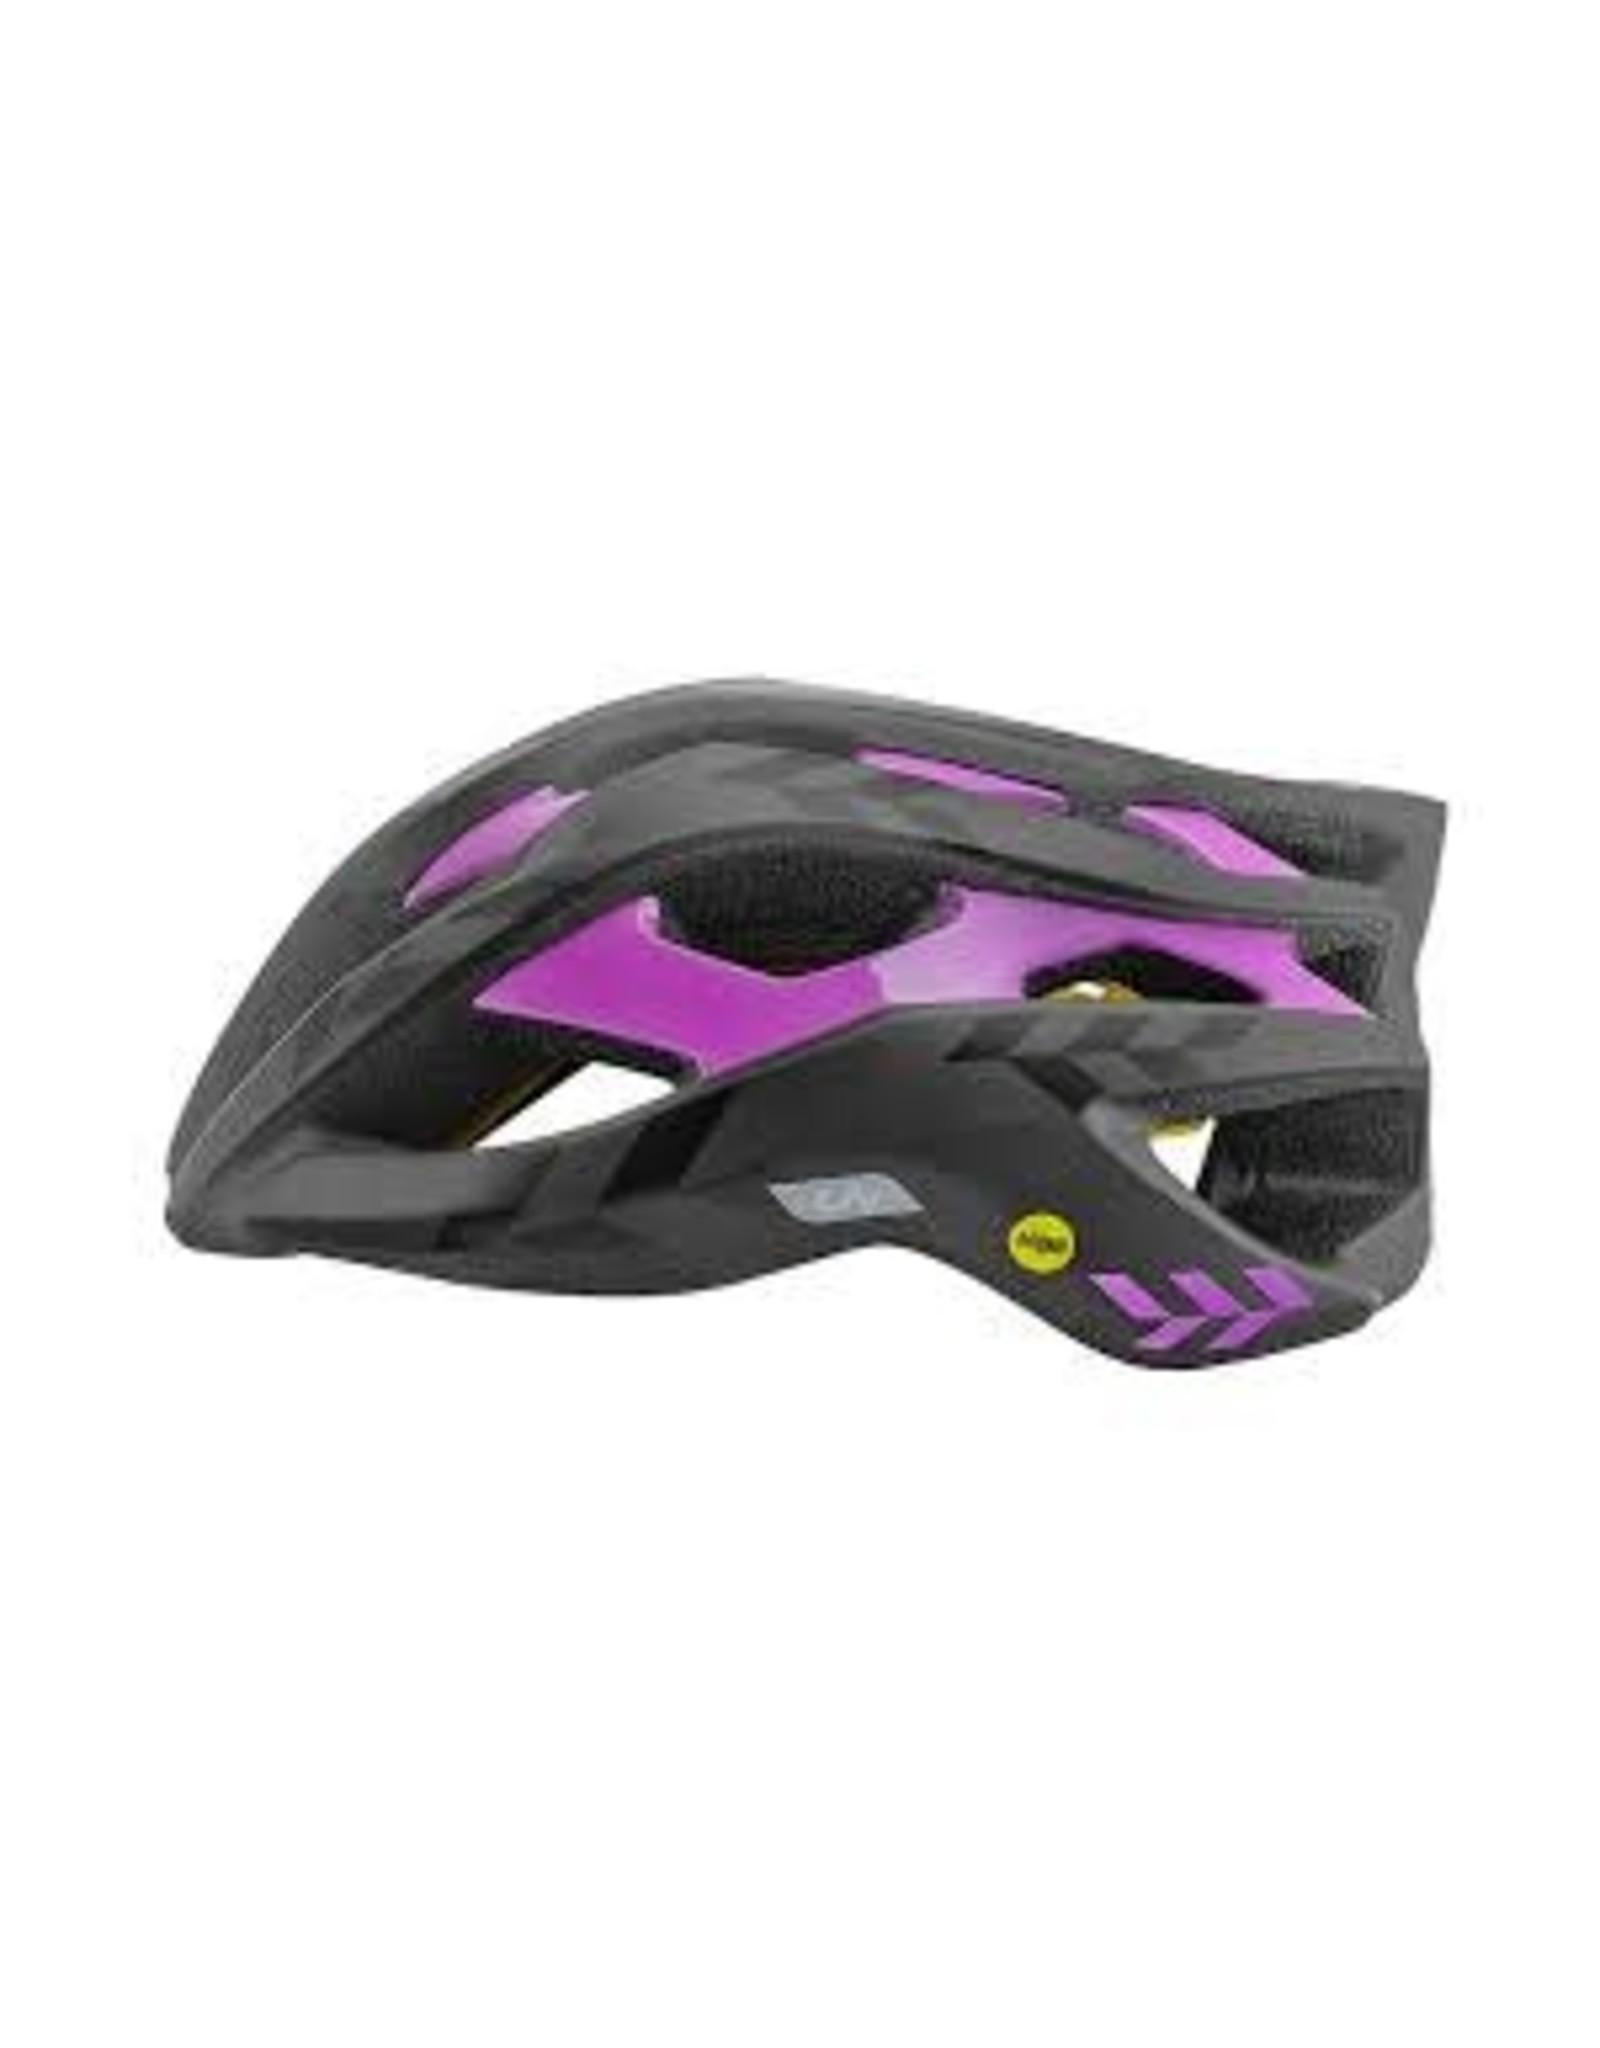 Liv LIV Rev Helmet MIPS MD Black/Purple